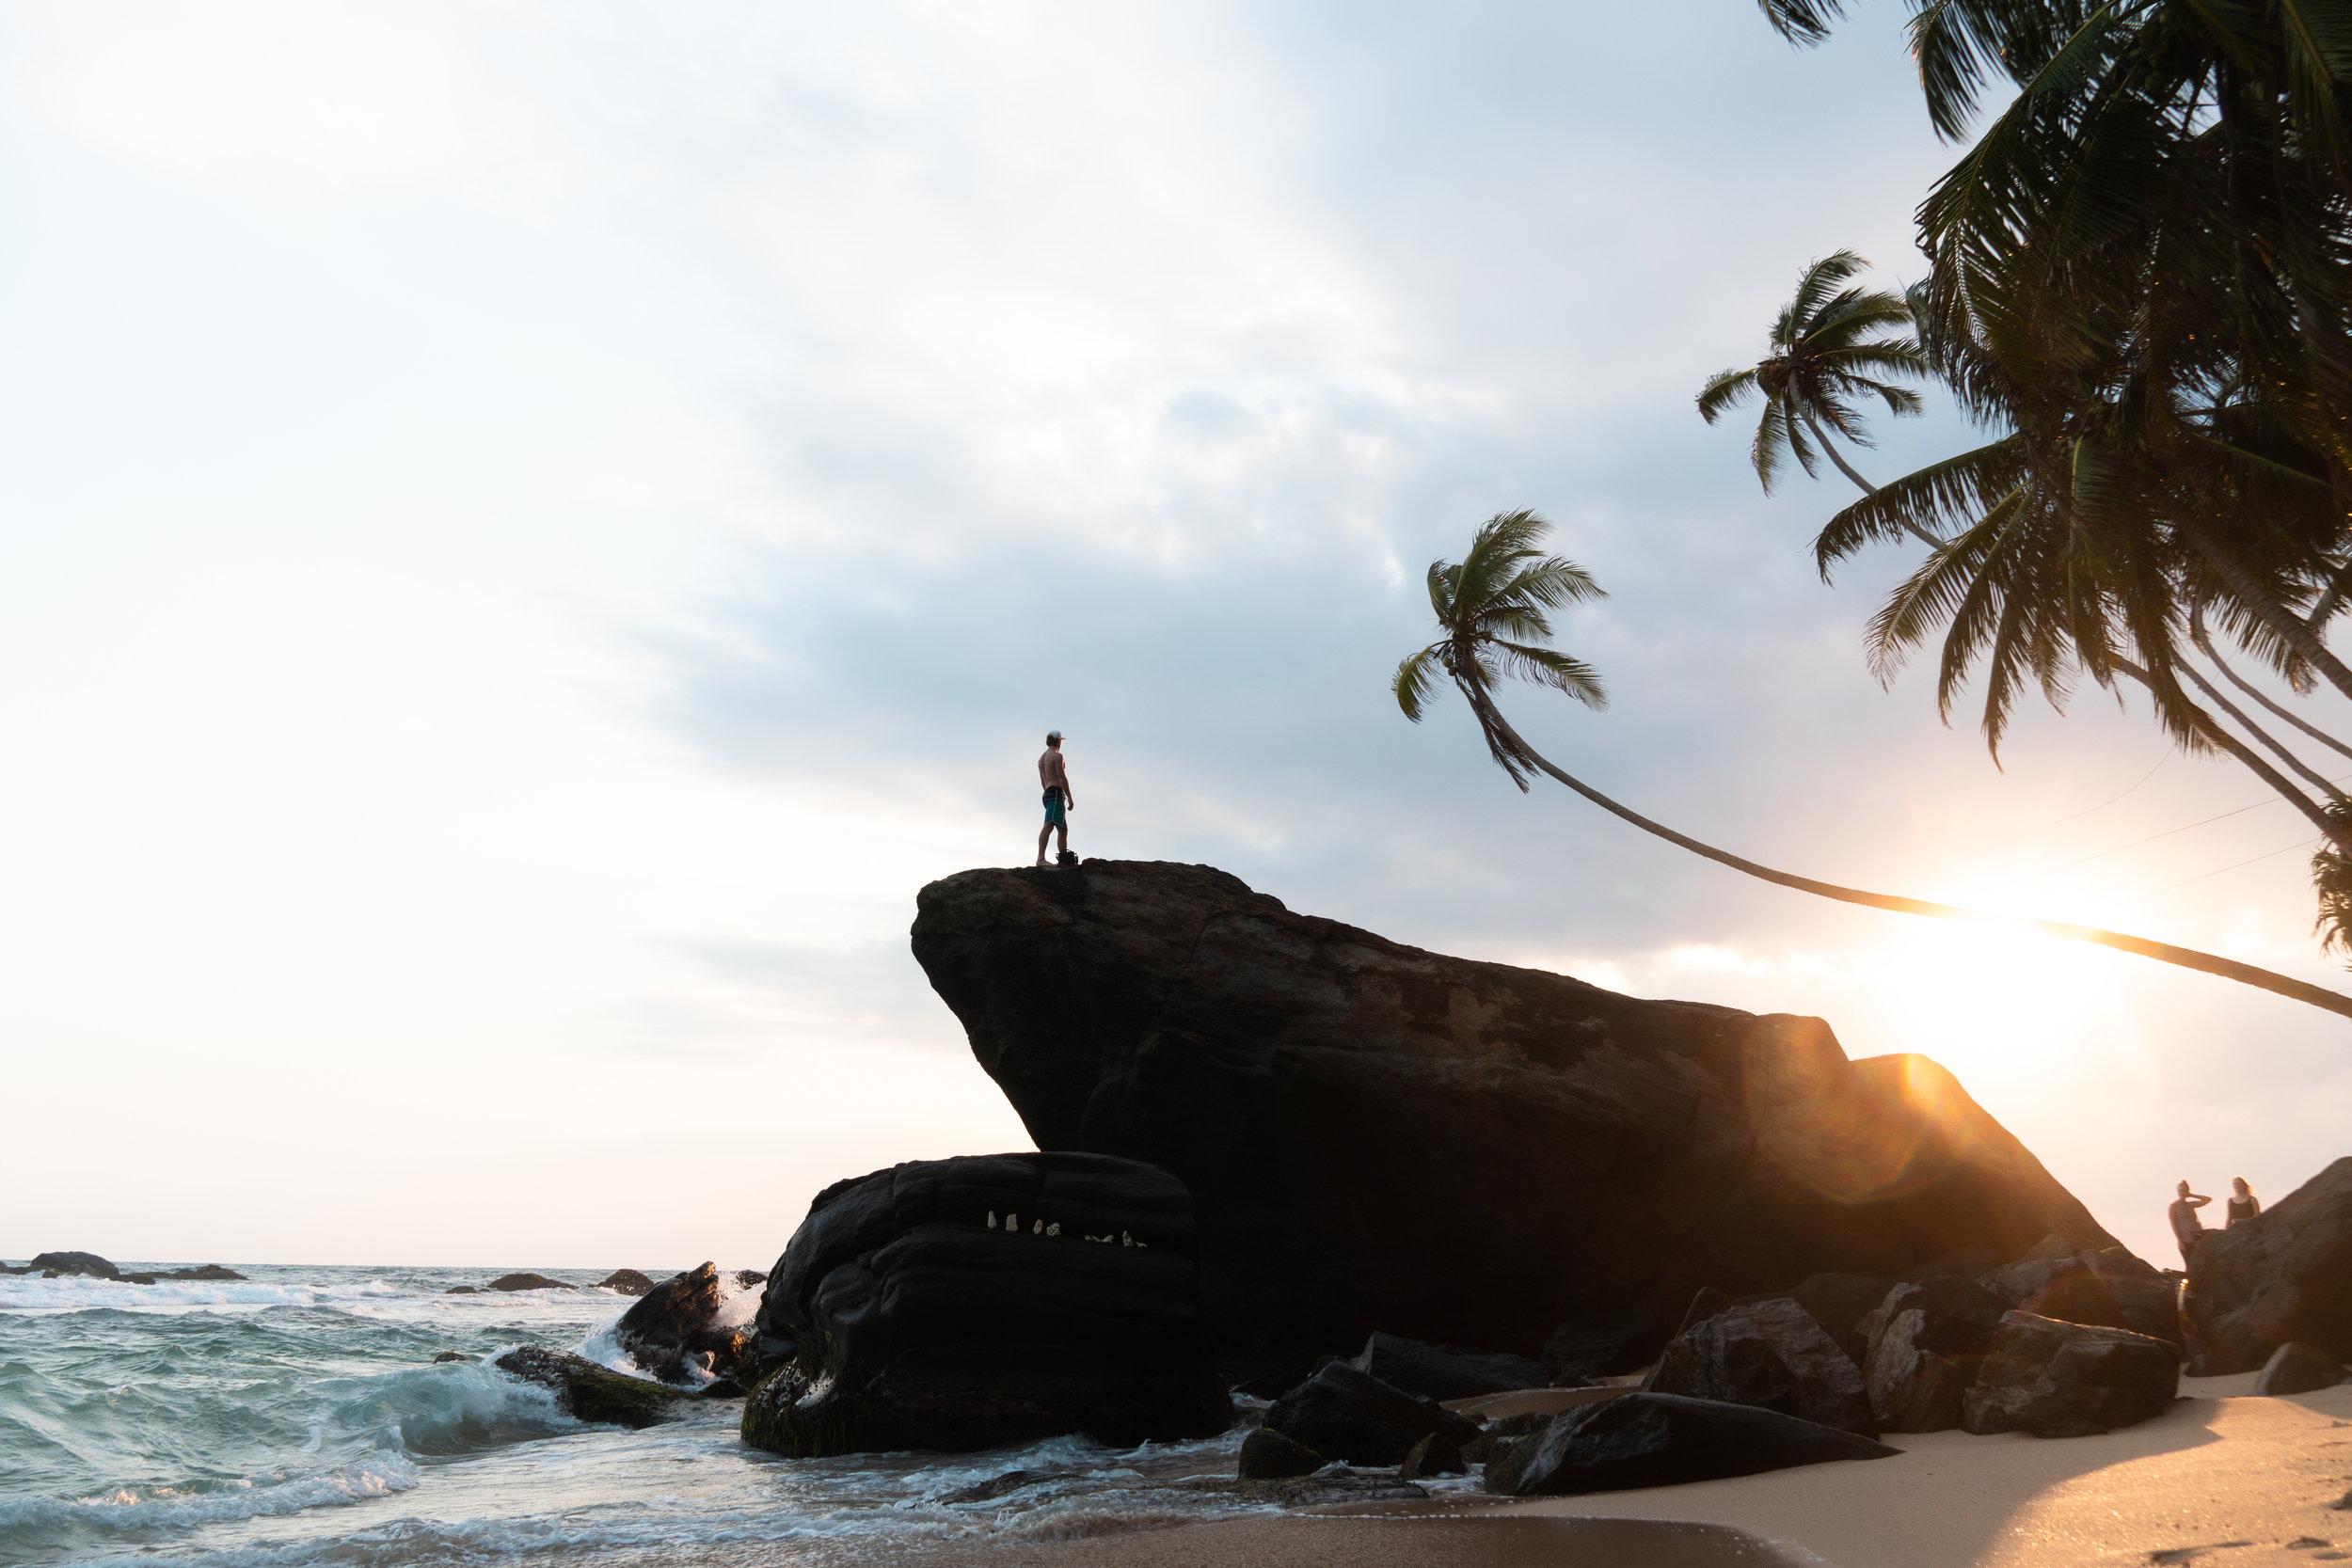 Dalawella Beach Unawatuna. Layback Surf Retreat Weligama Sri Lanka. Surf school. Surf lessons. Private rooms & Dorms. Surf camp. Boutique Hotel, Hostel.